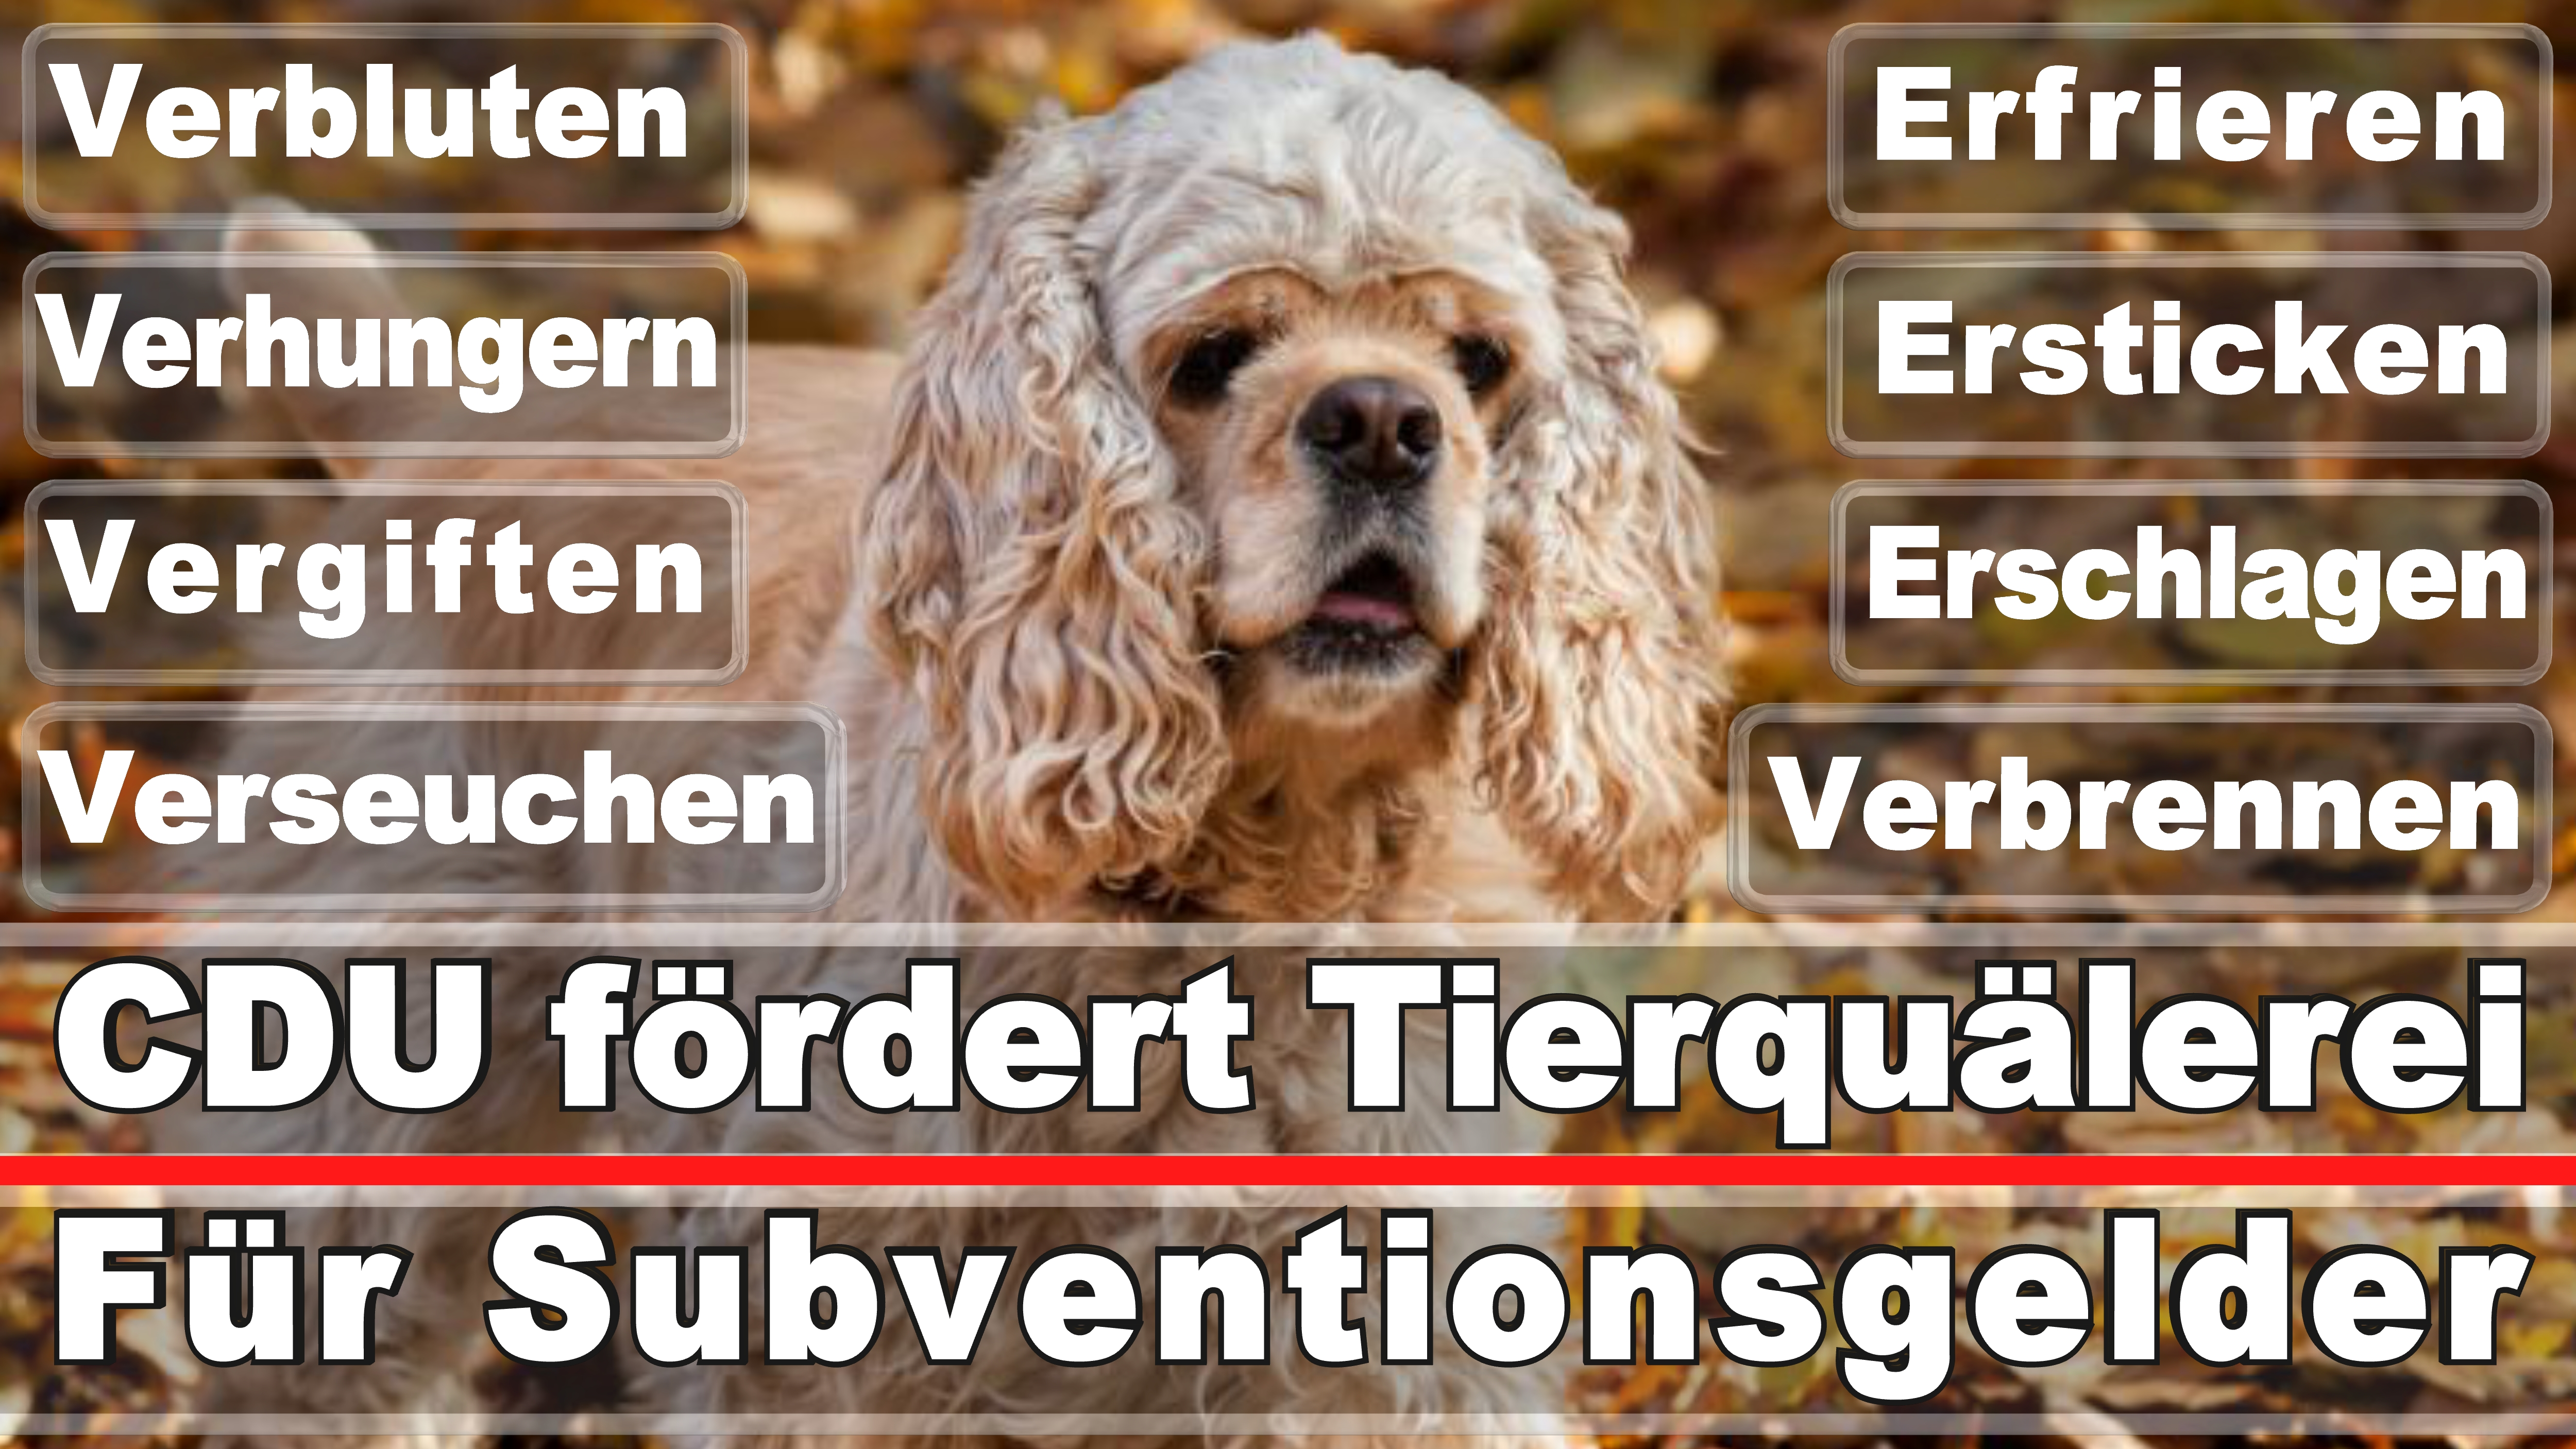 Landtagswahl-Bundestagswahl-CDU-SPD-FDP-AFD-Linke-Piraten-Tierschutzpartei (36)